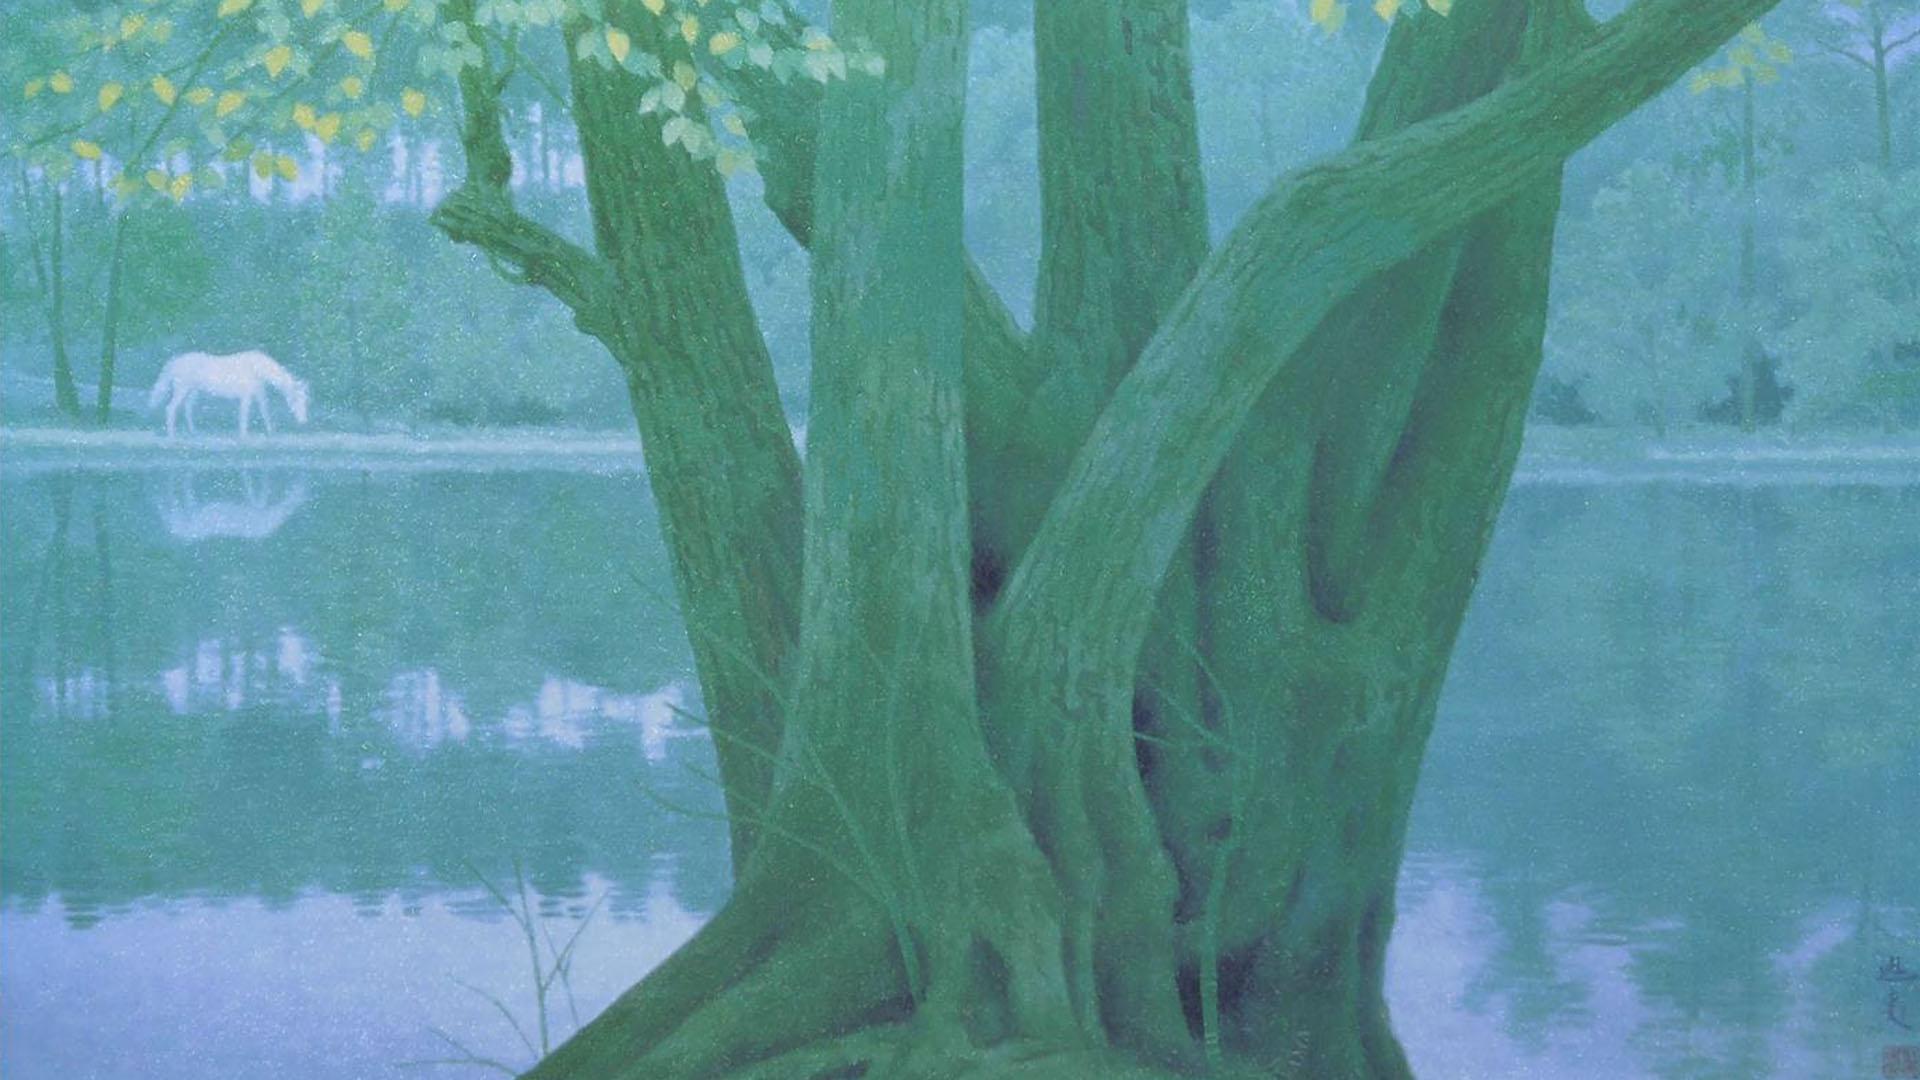 東山魁夷 若葉の季節 Higasgiyma Kaii - Wakaba no kisetsu 1920x1080